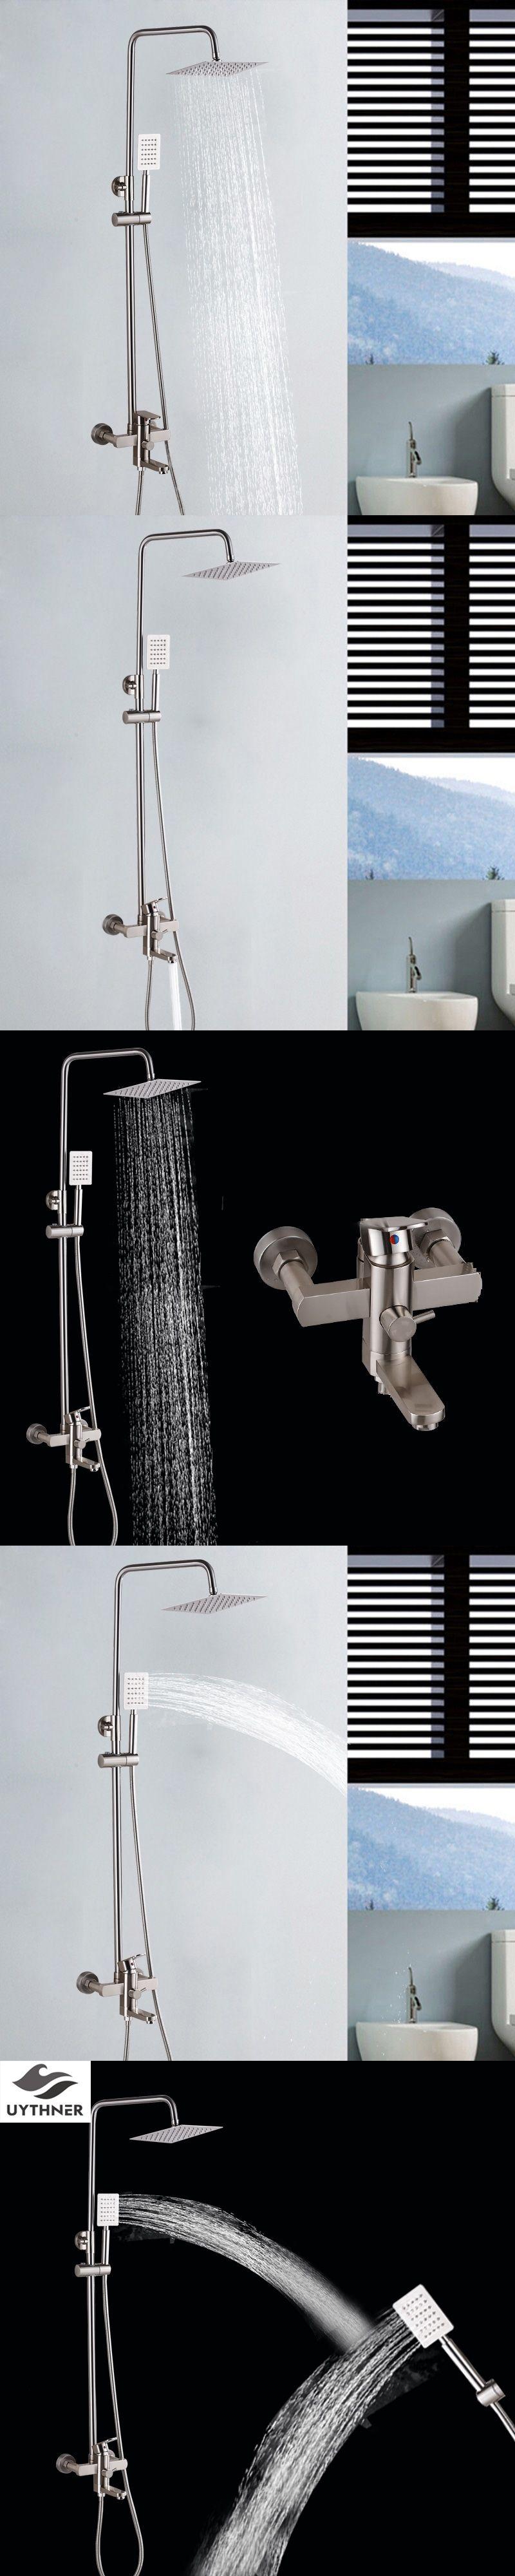 Uythner Fashion Style 8 Inch Brushed Nickel Bathroom Shower Faucet ...